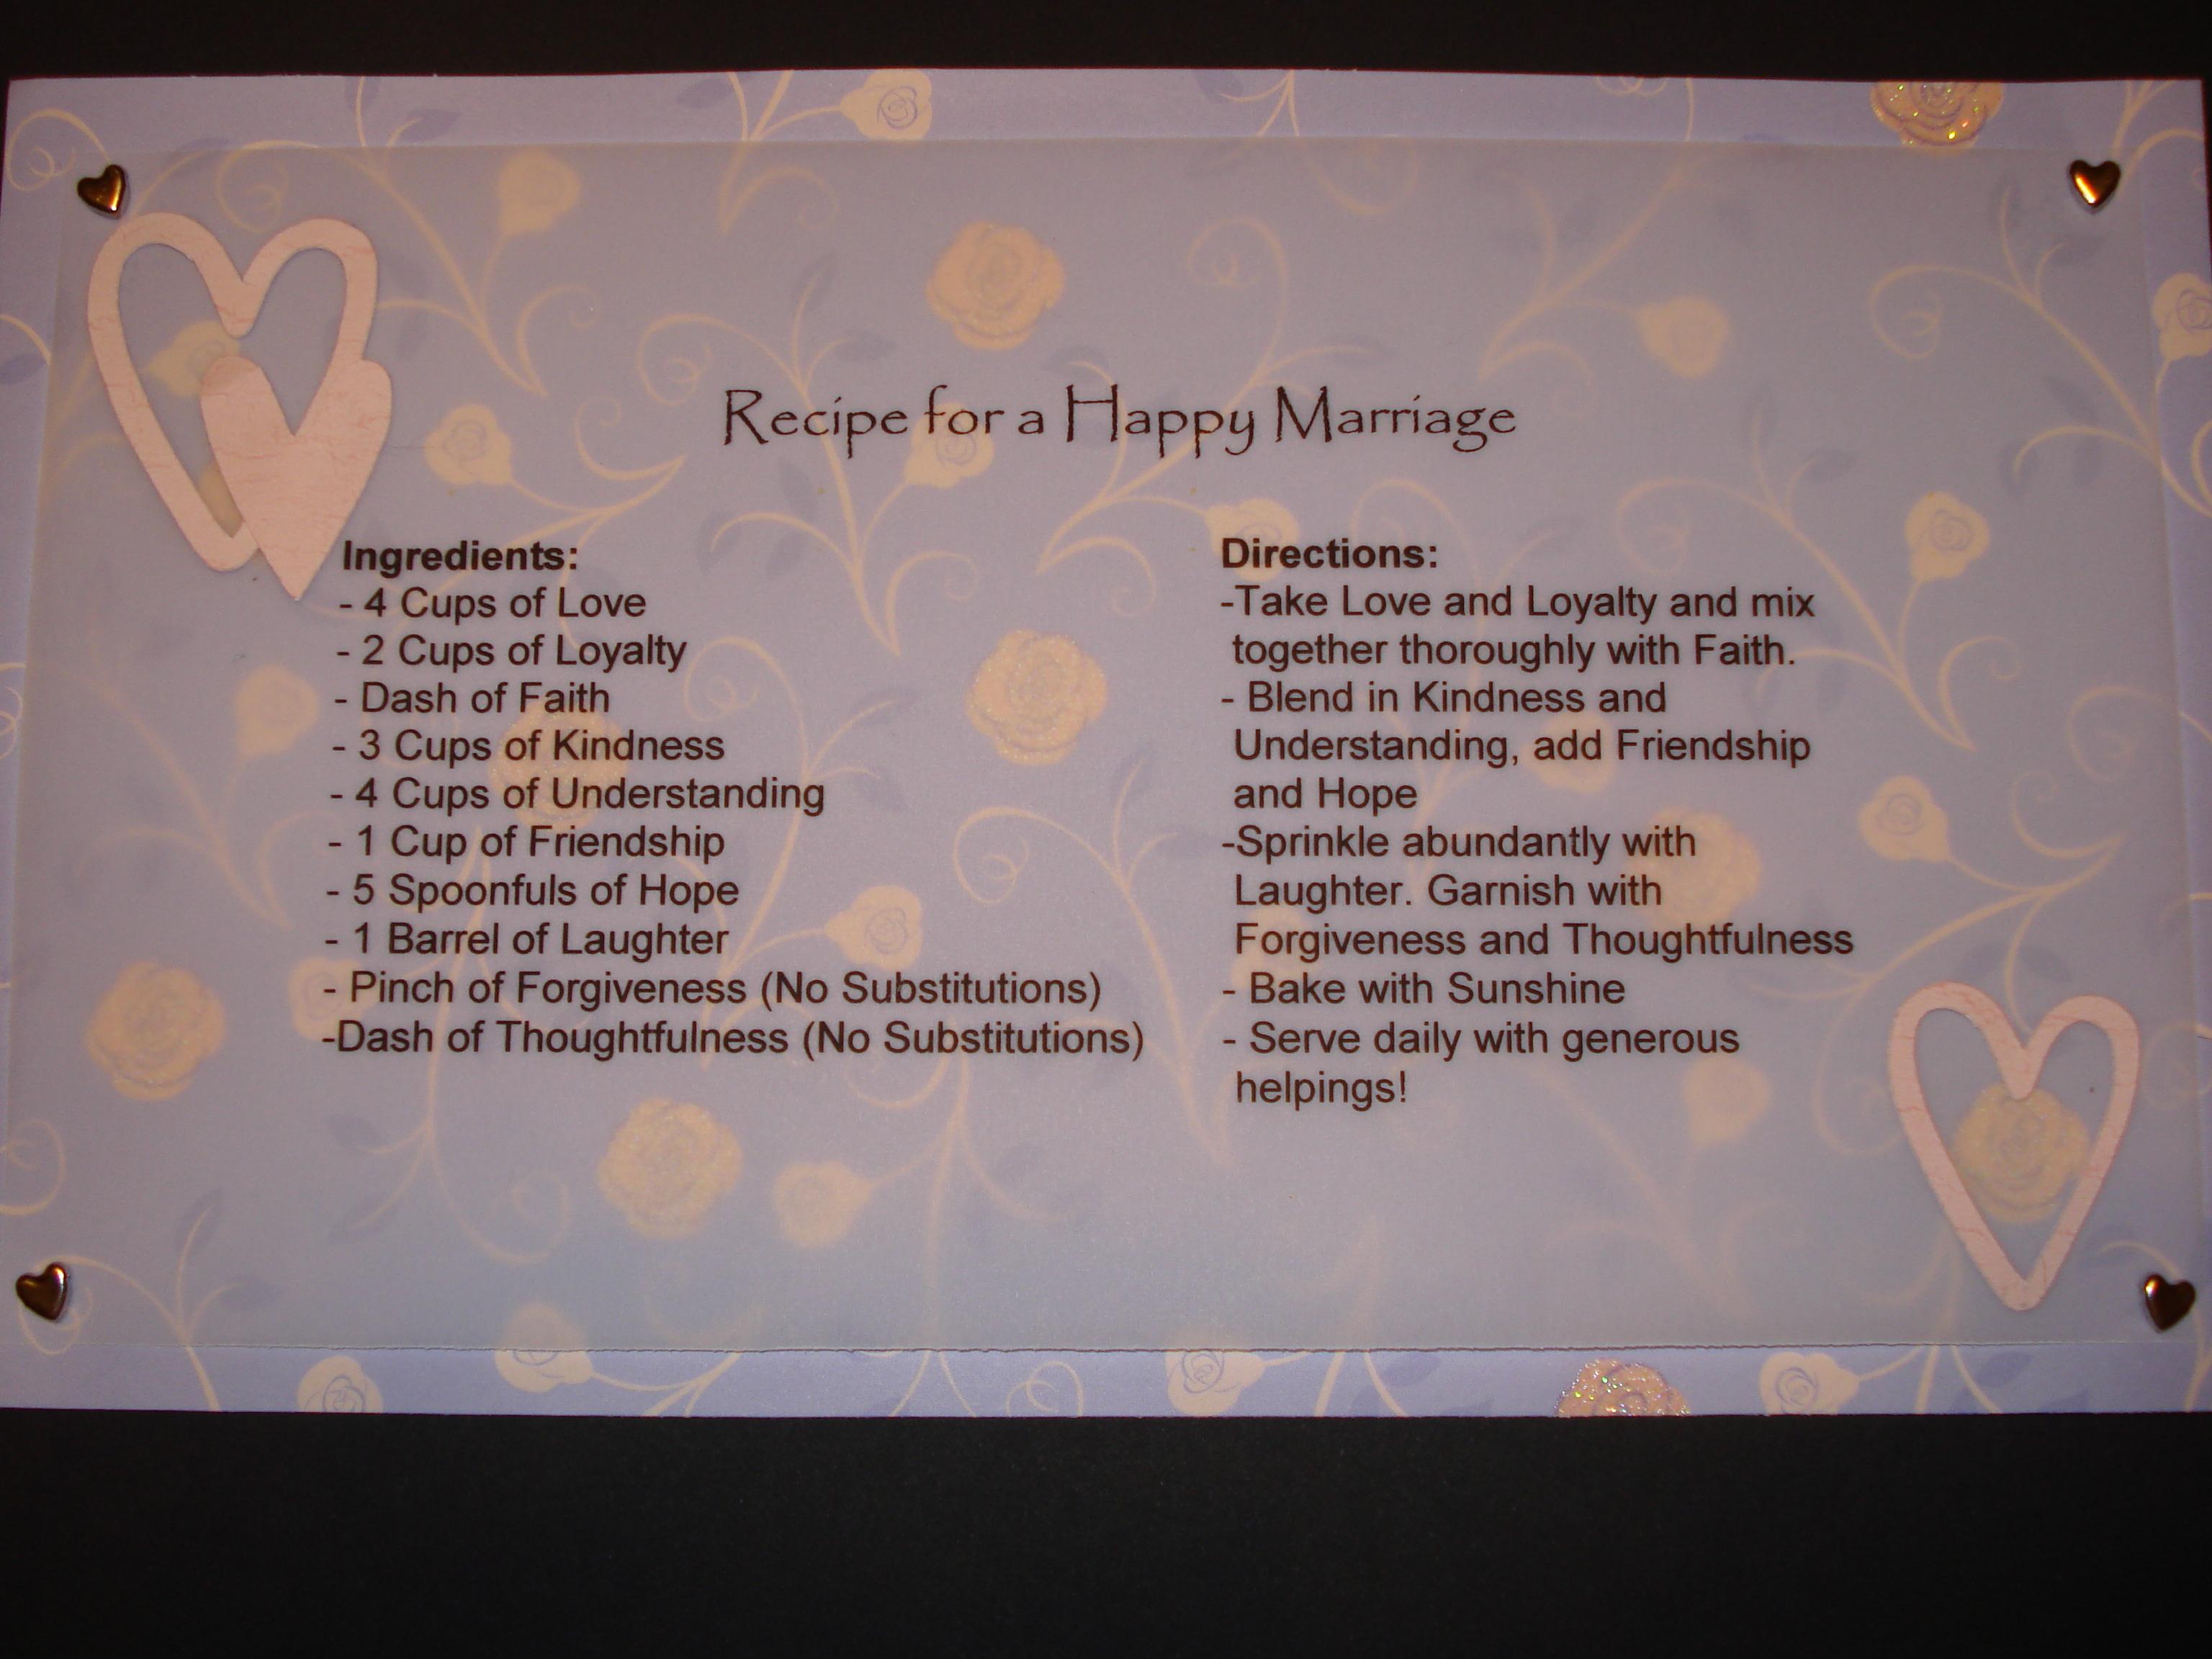 creative bridal shower gift ideas wedding shower gift ideas Advertisements